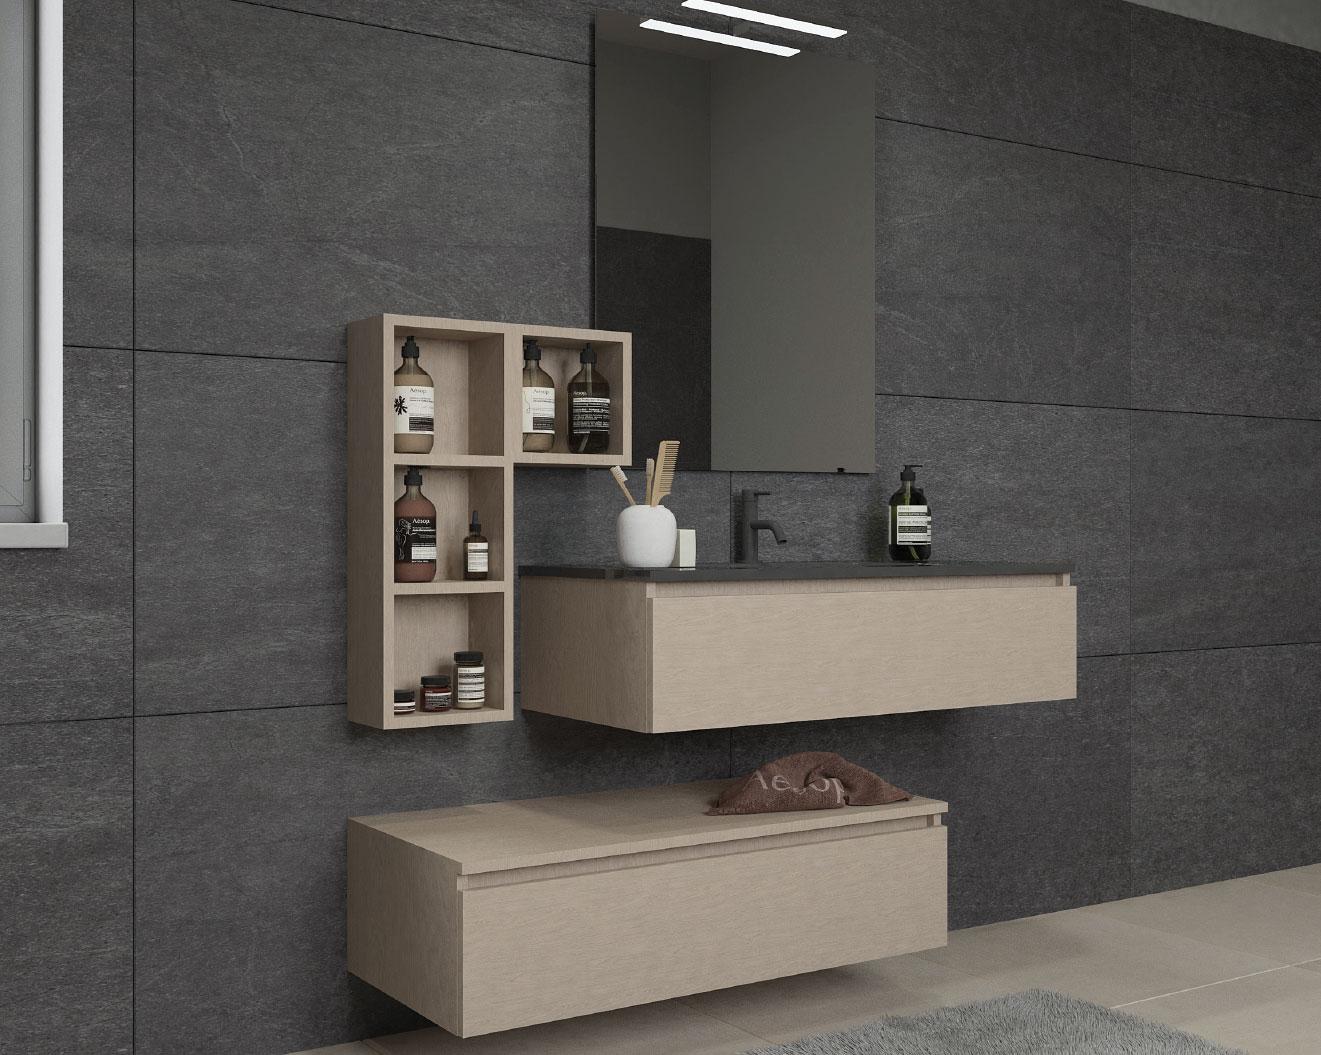 Bagno design bagnitaliani for Bagni designer